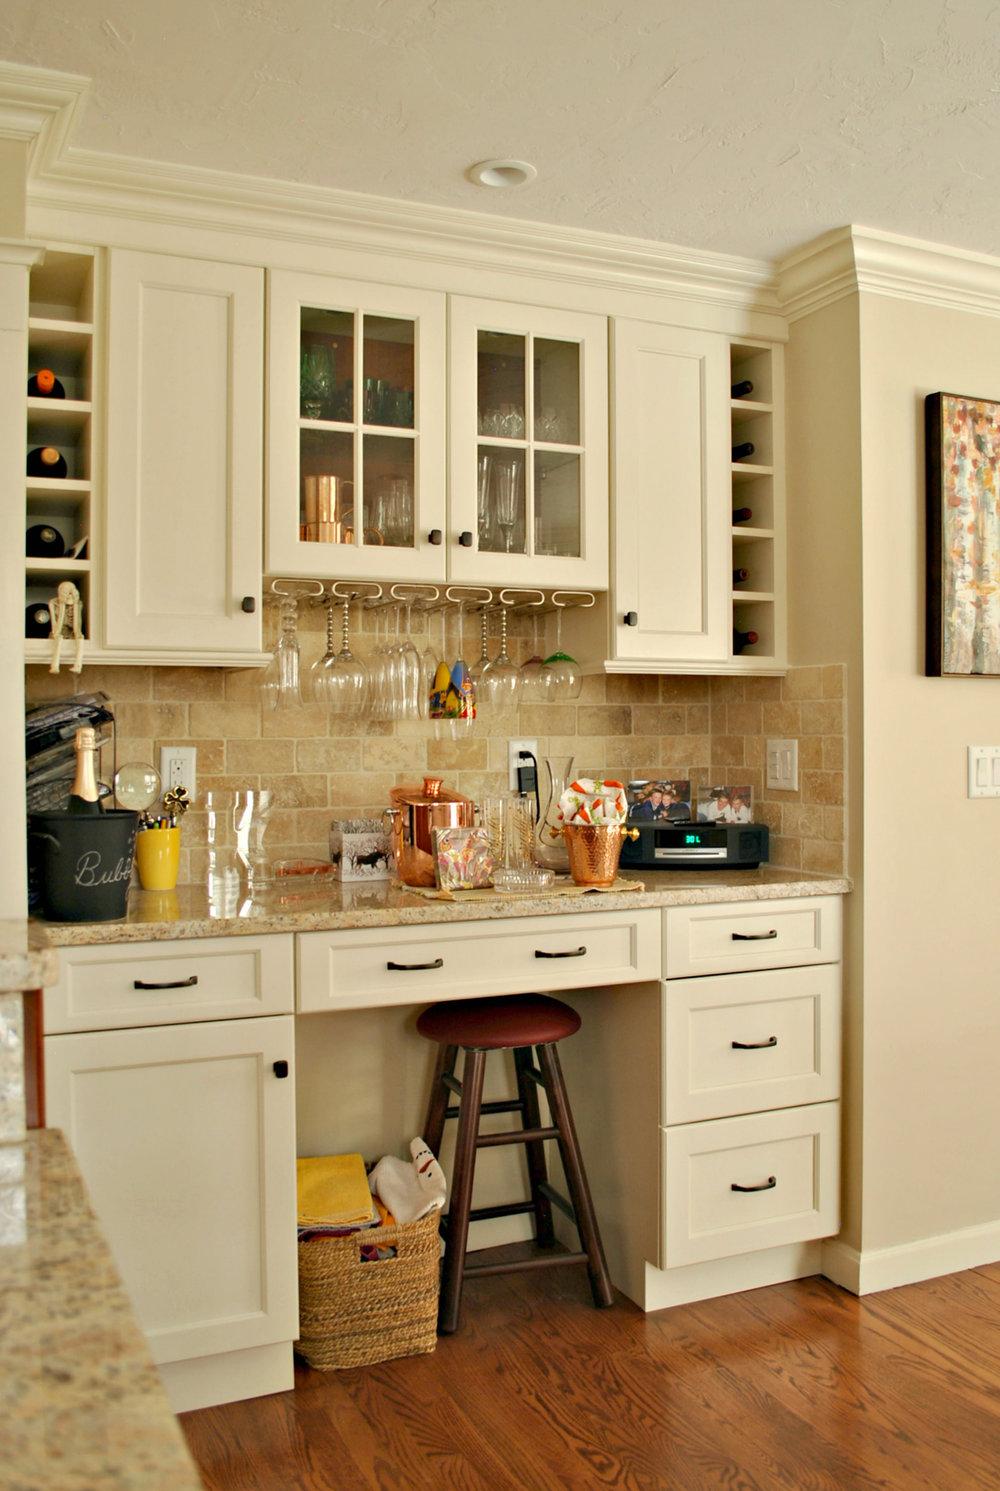 Shivakashi Tops White Cabinets Google Search In 2020 Kitchen Remodel Kitchen Plans Custom Kitchen Remodel